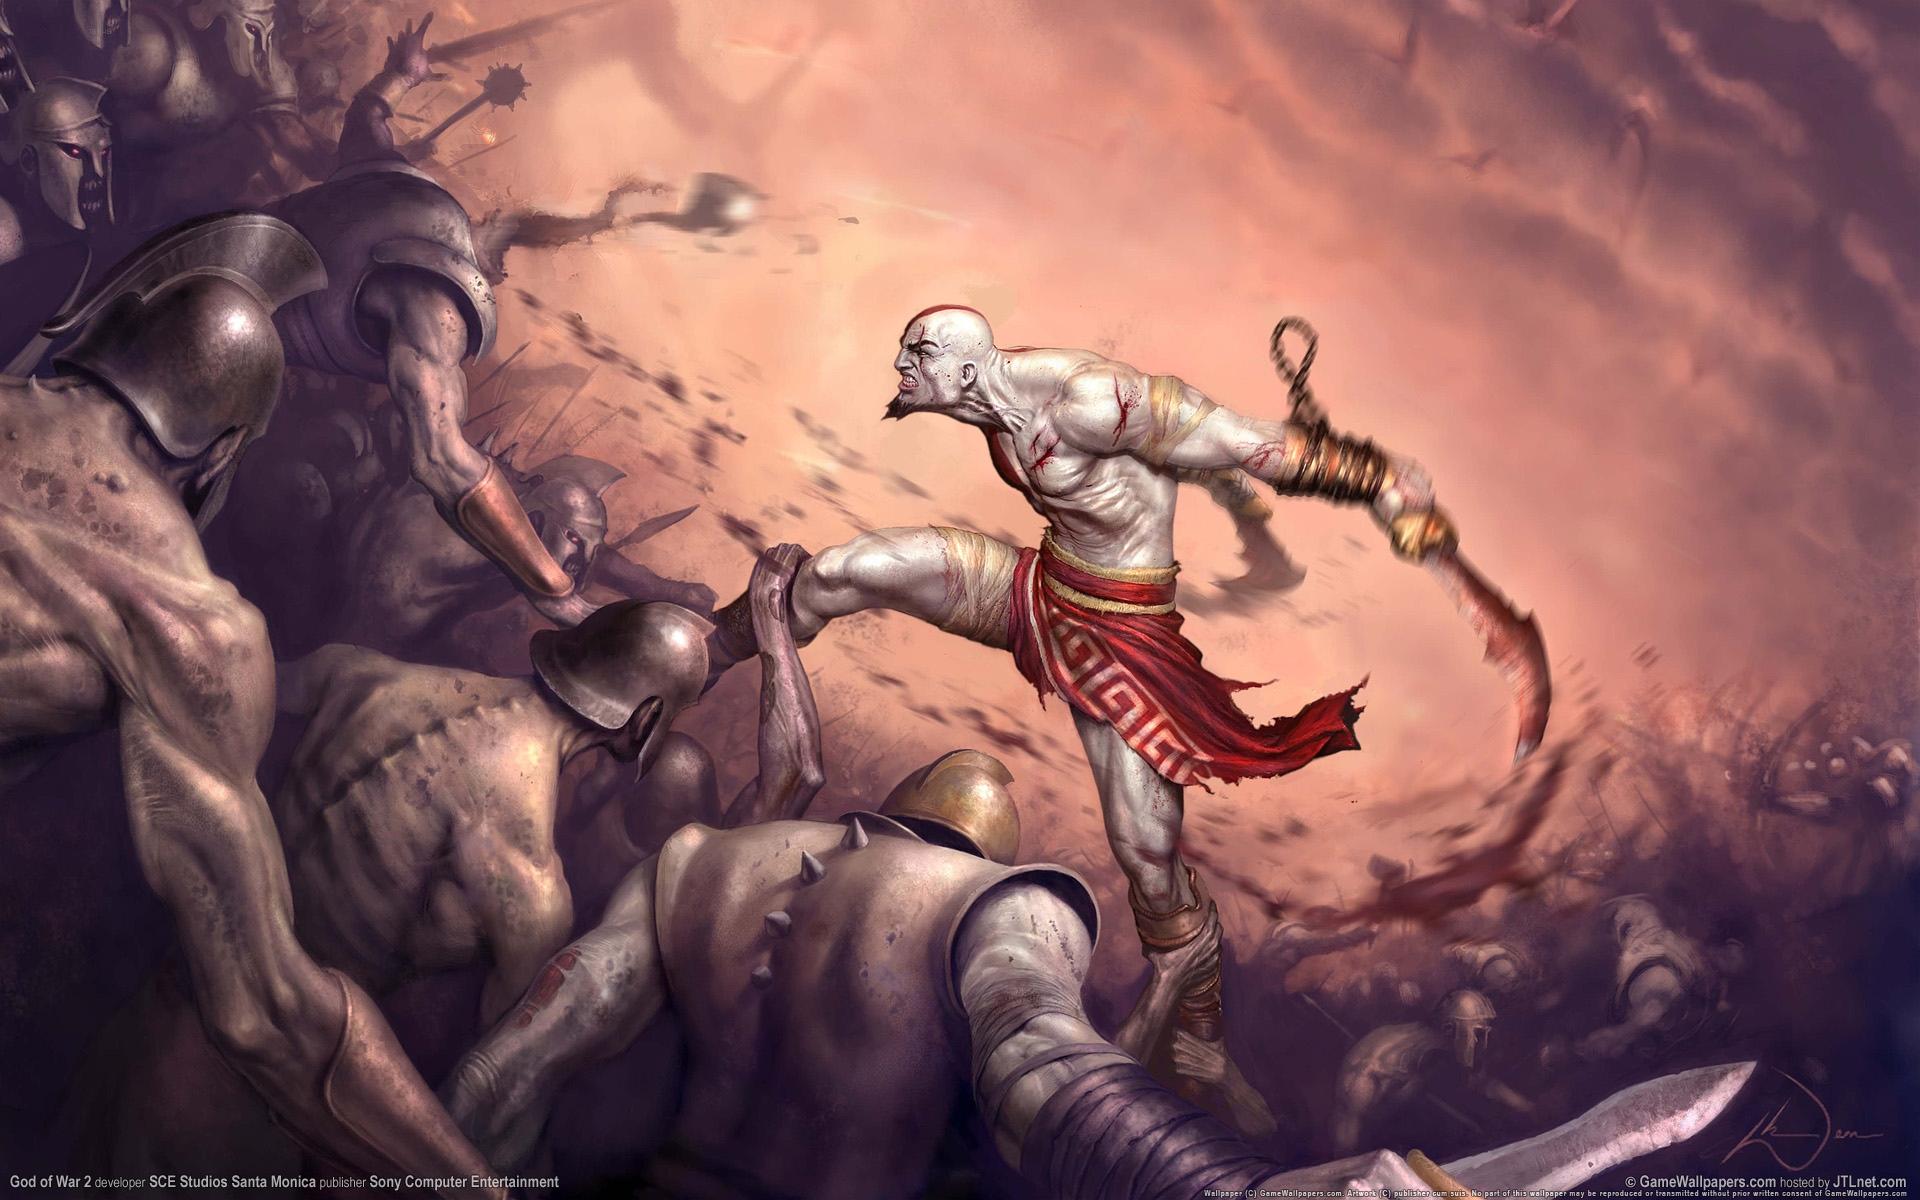 Wallpaper God Of War 2 14 1920x1200 By Mekmagma On Deviantart